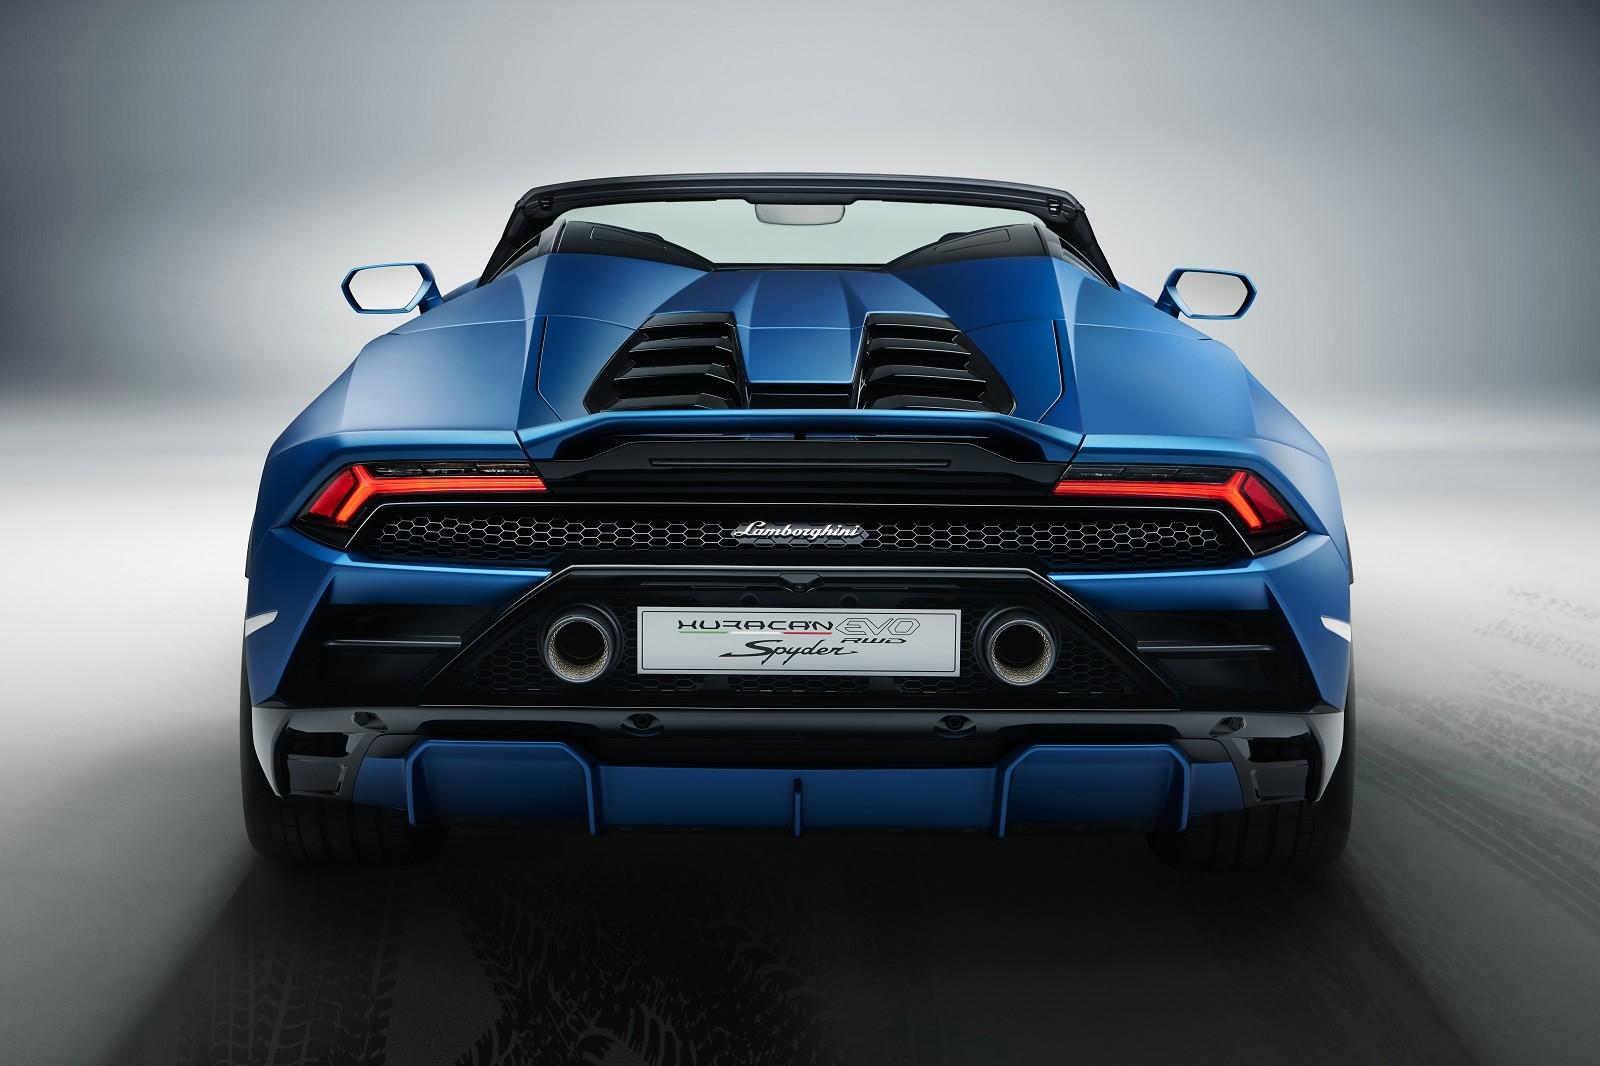 Foto de Lamborghini Huracan EVO Spyder RWD (12/14)